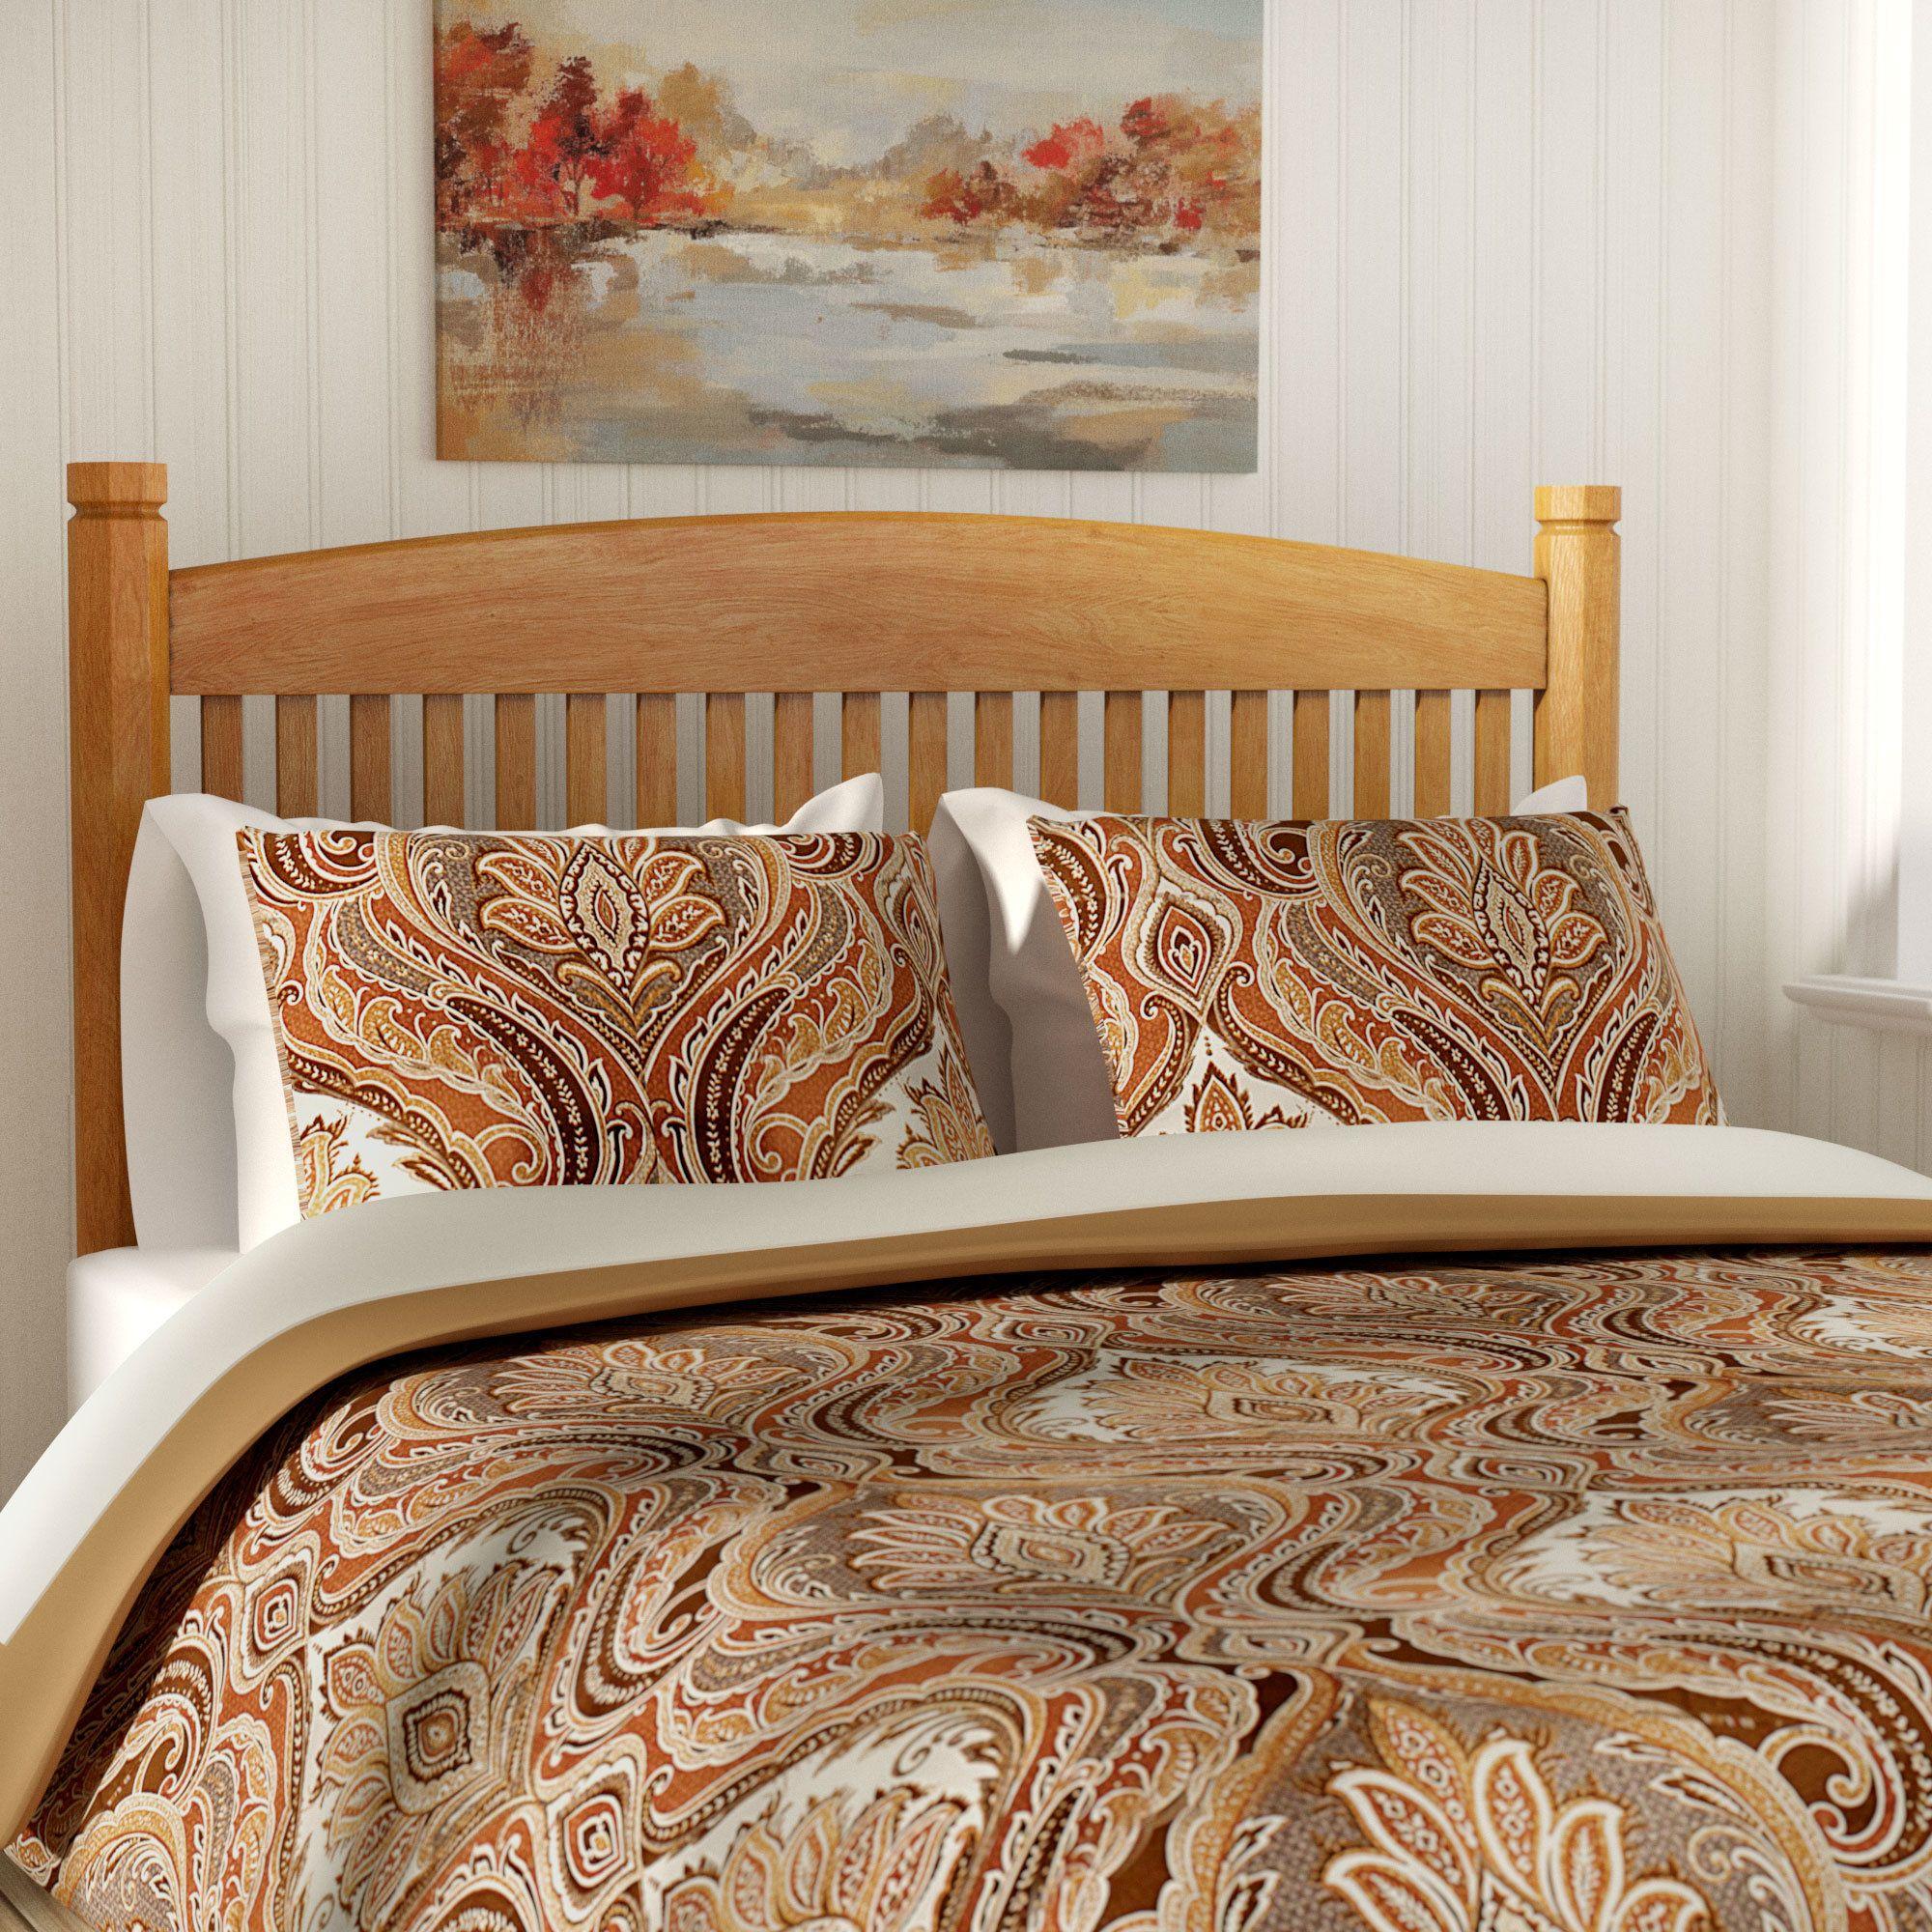 Cartier Bed in a Bag Set Bed, Bed in a bag, Bedding sets